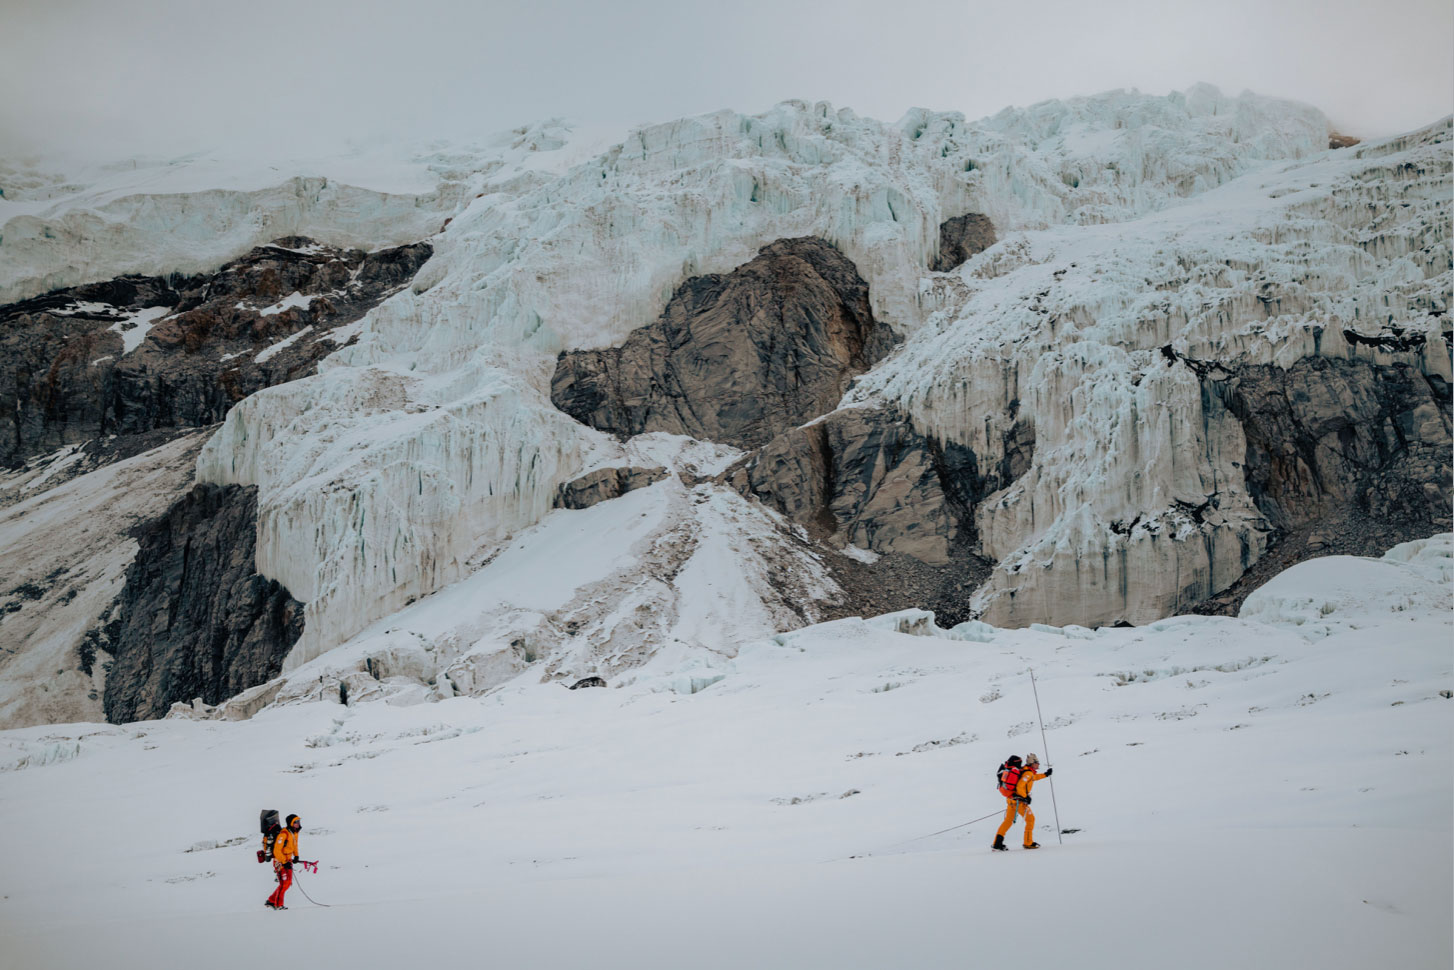 Nick Kalisz Hilaree Nelson Dutch Simpson North Face MSR Lhotse